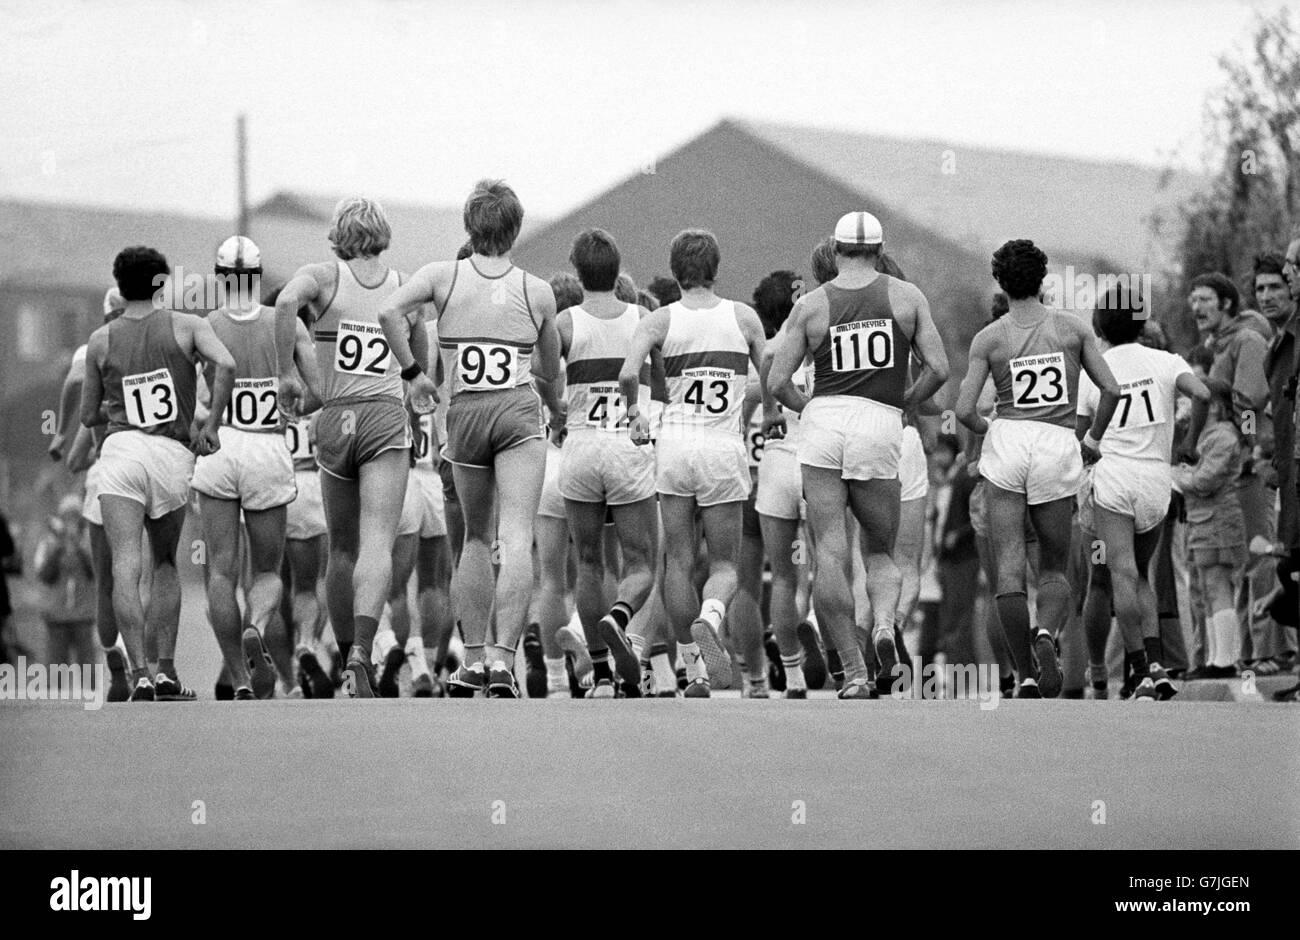 Athletics - 1977 IAAF World Race Walking Cup - Milton Keynes - Stock Image